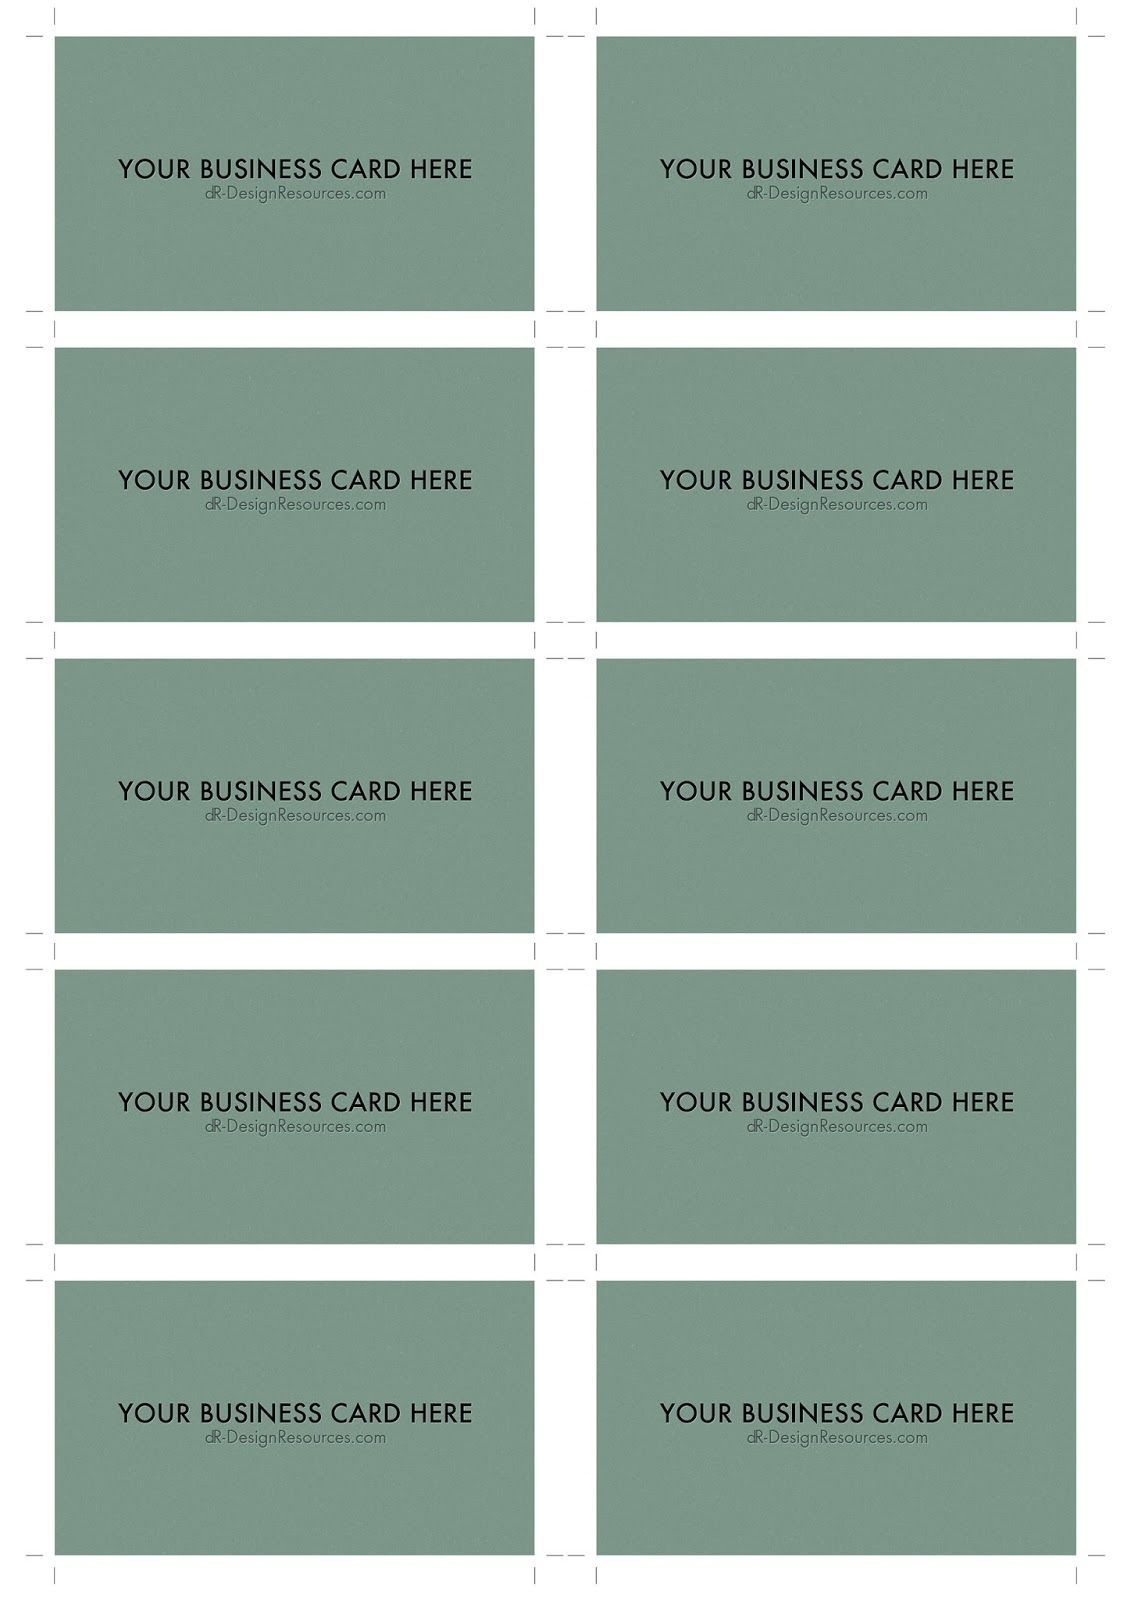 A4 Business Card Template Psd 10 Per Sheet In 2020 Business